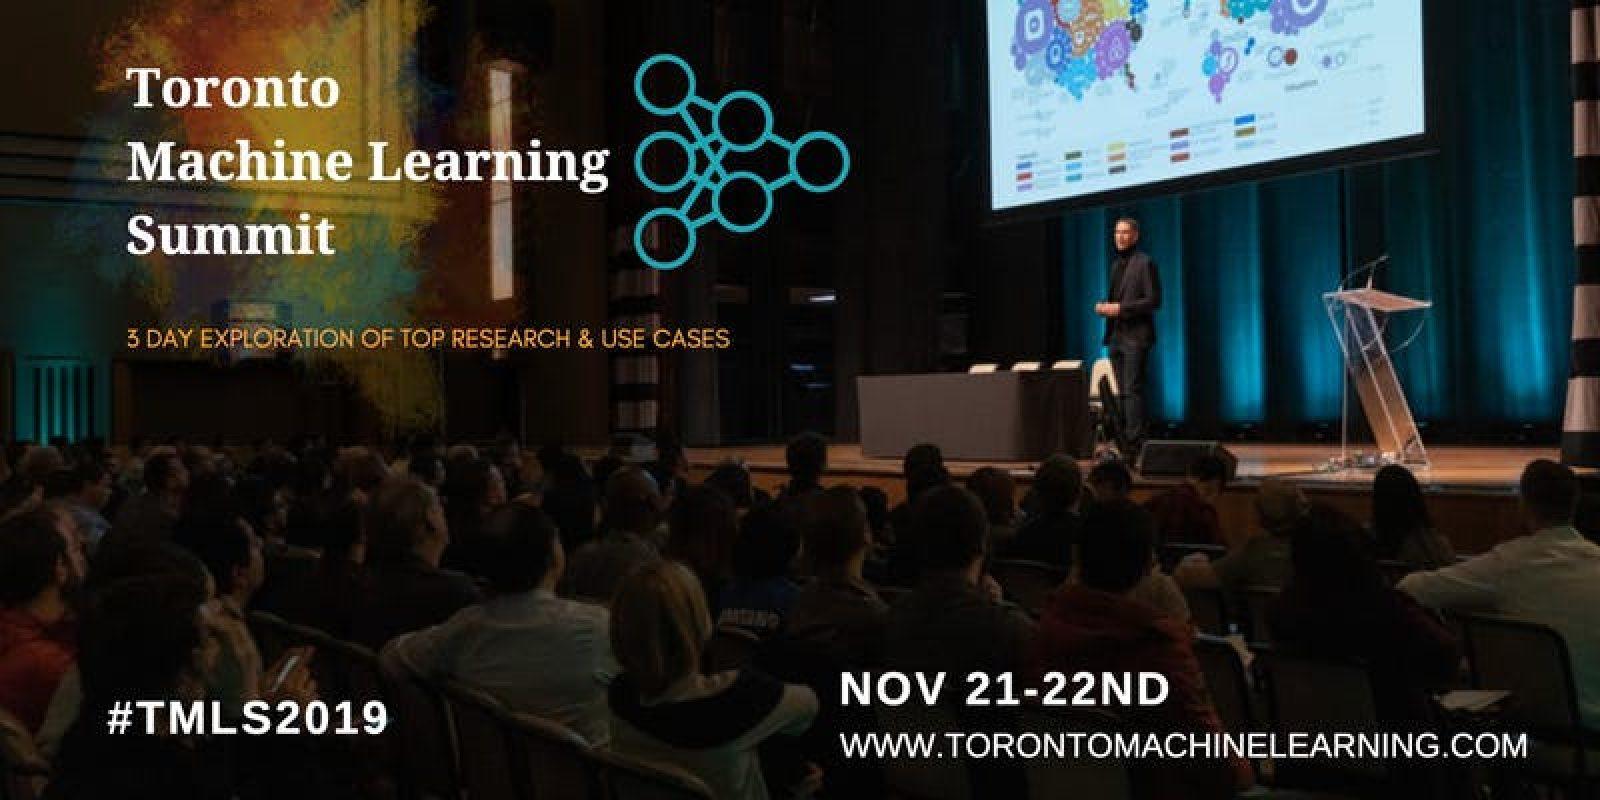 Toronto Machine Learning Summit 2019